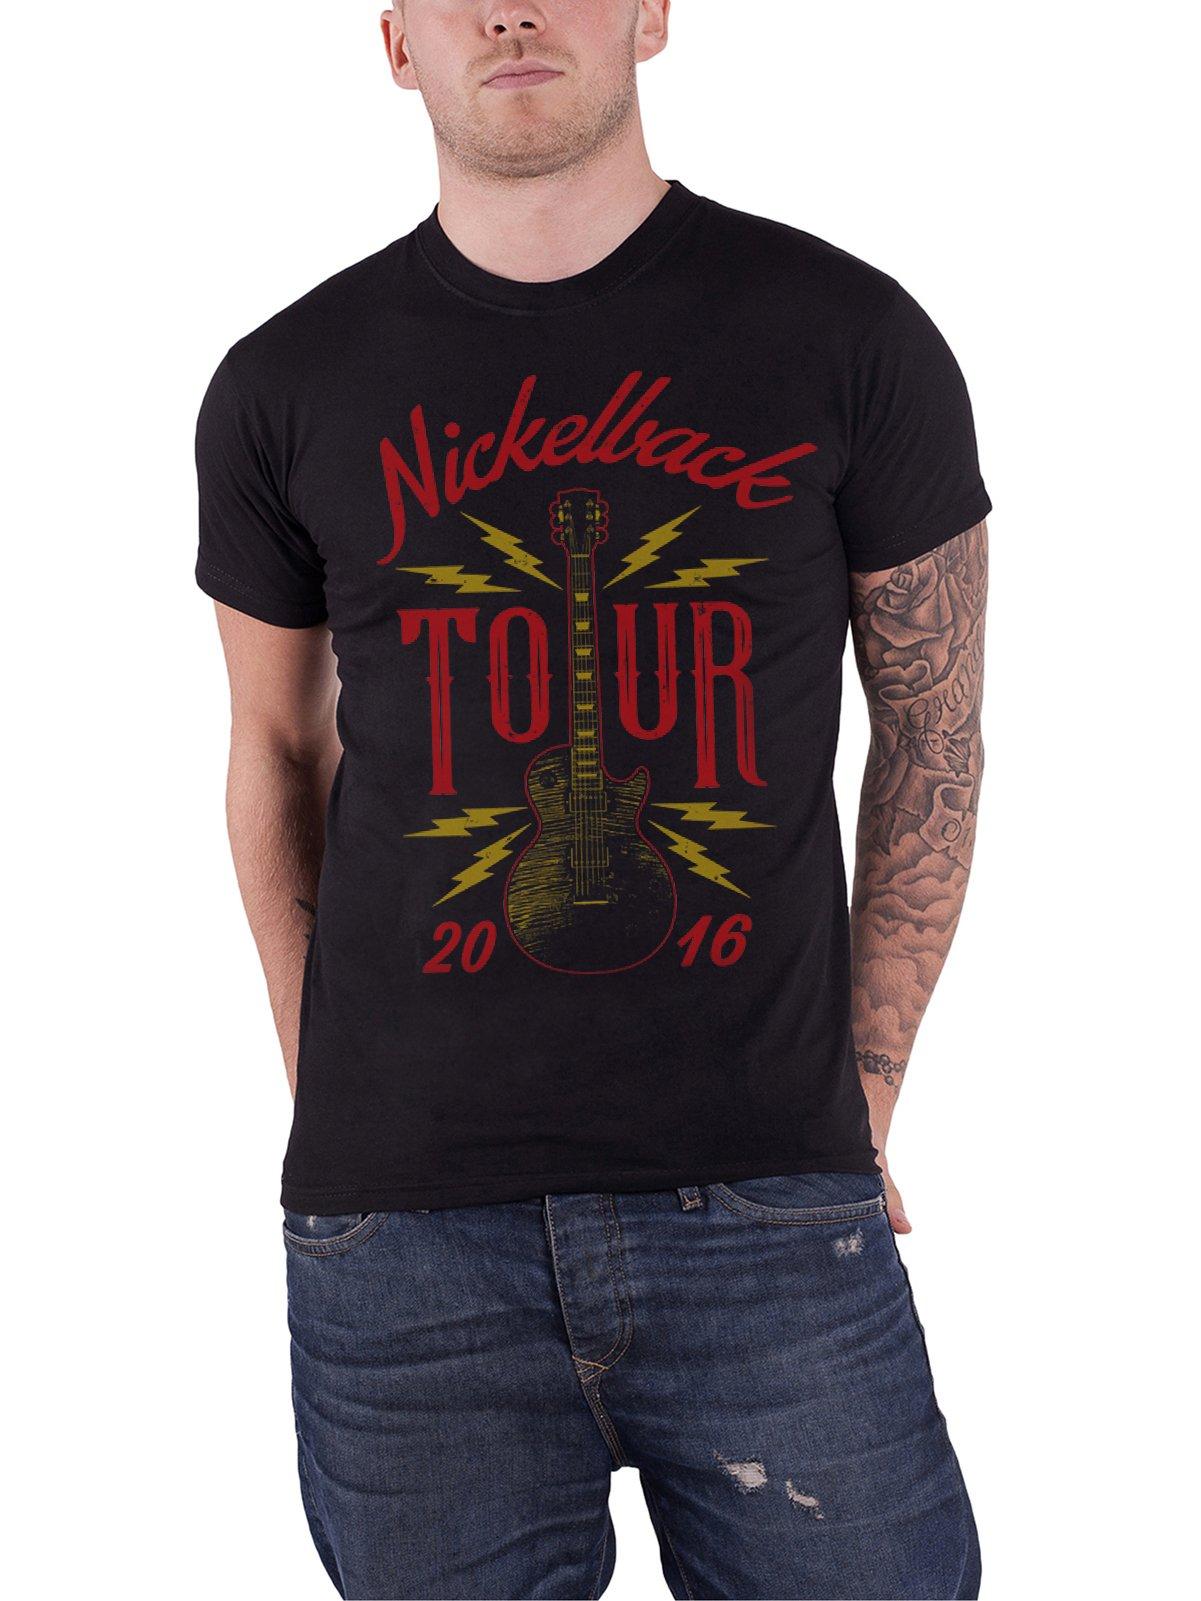 Nickelback T Shirt Guitar Tour 2016 Band Logo S Black